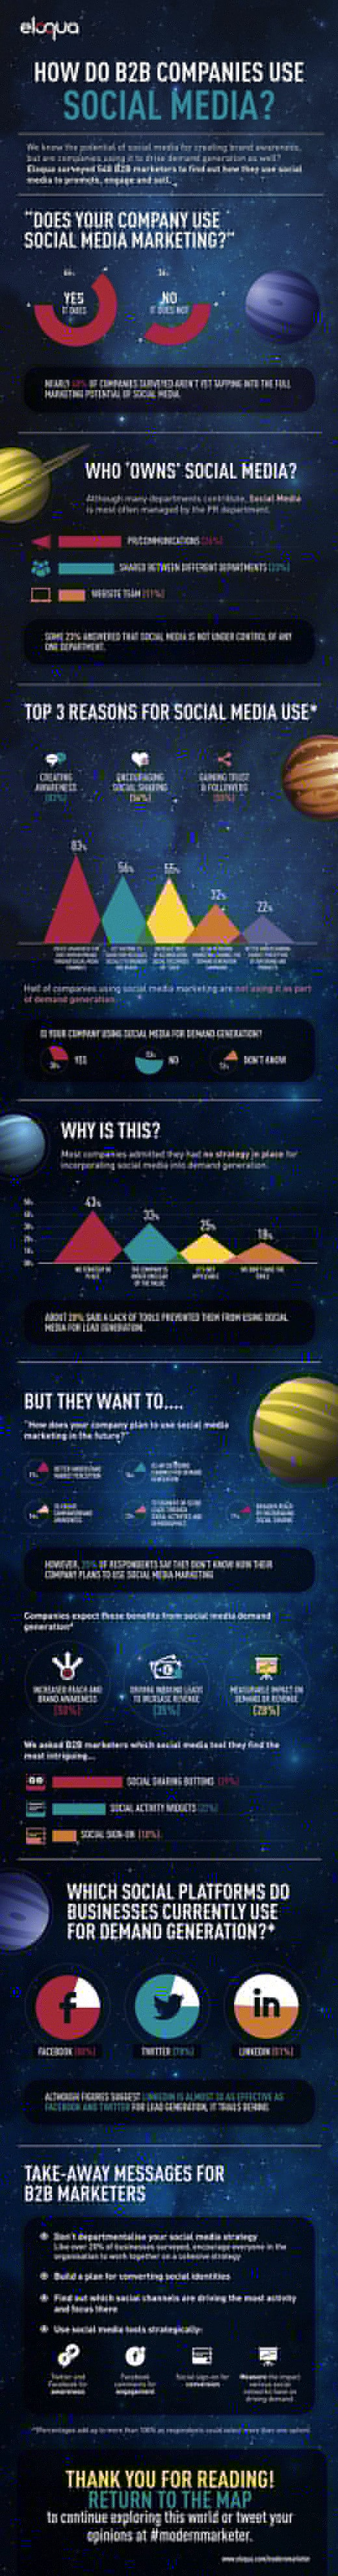 b2b social media use infographic